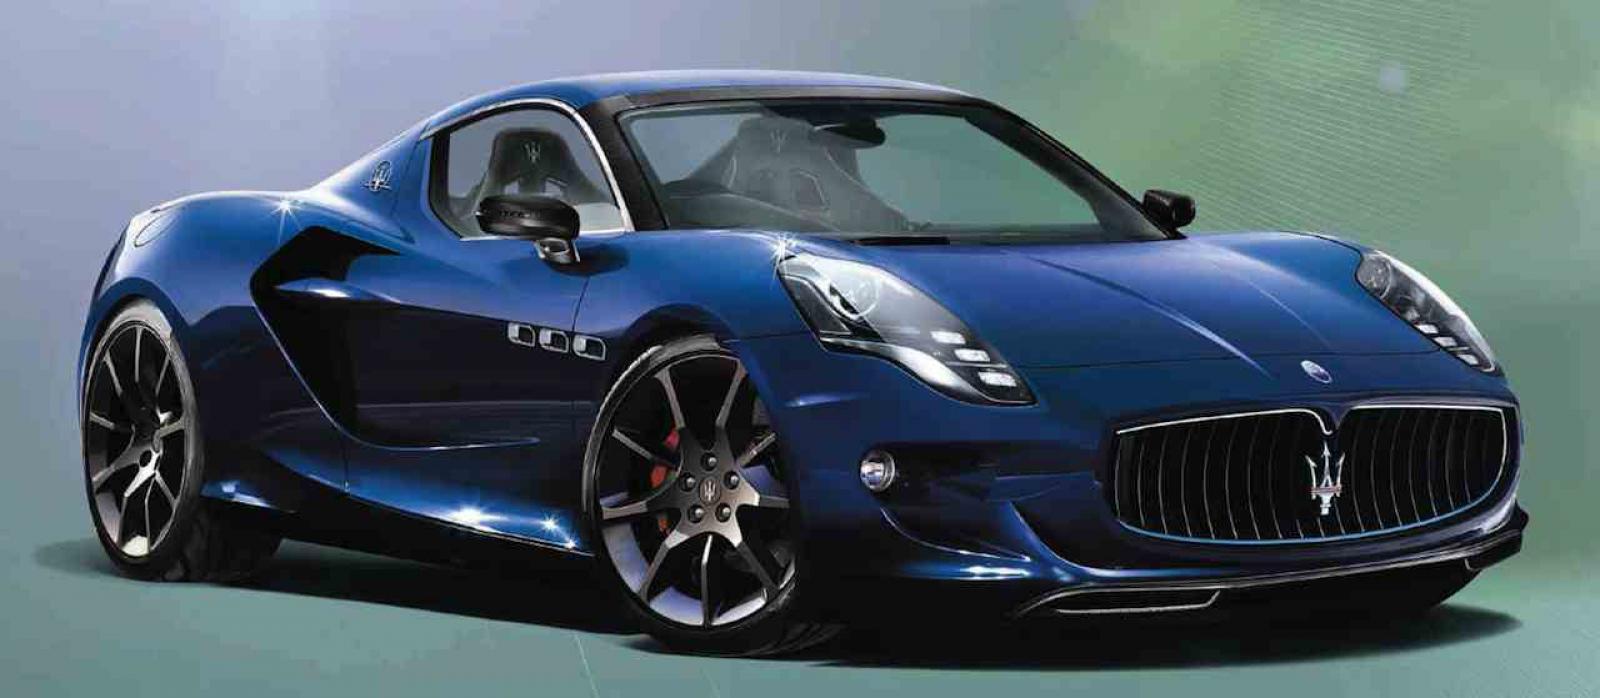 2015 Maserati GranTurismo - Information and photos - ZombieDrive